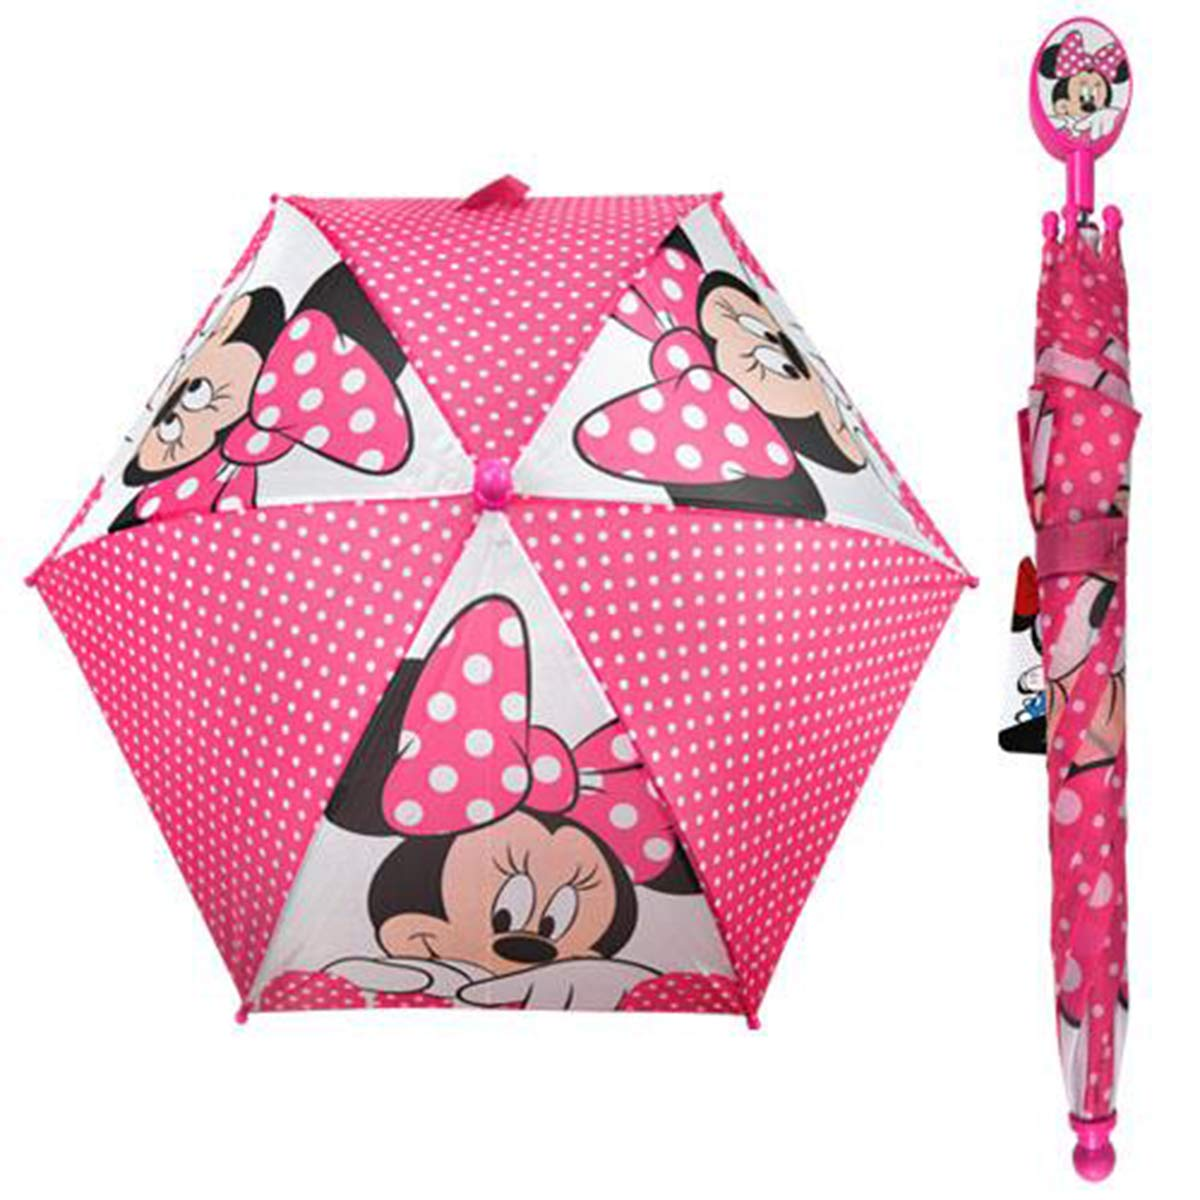 Disney Minnie Mouse Kids Umbrella by MGA (Image #1)